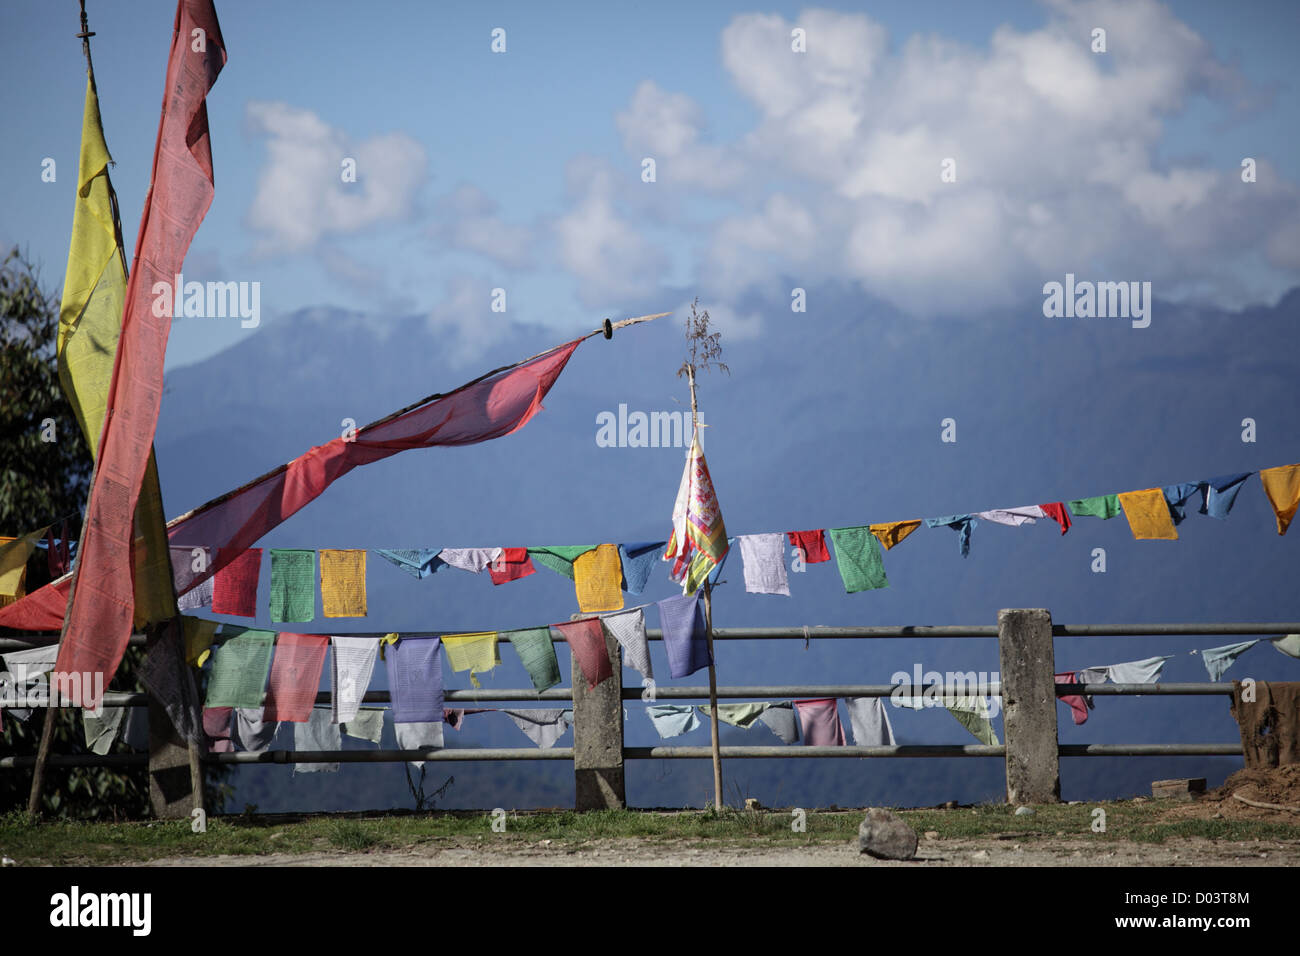 Prayer flags in Bhutan. - Stock Image